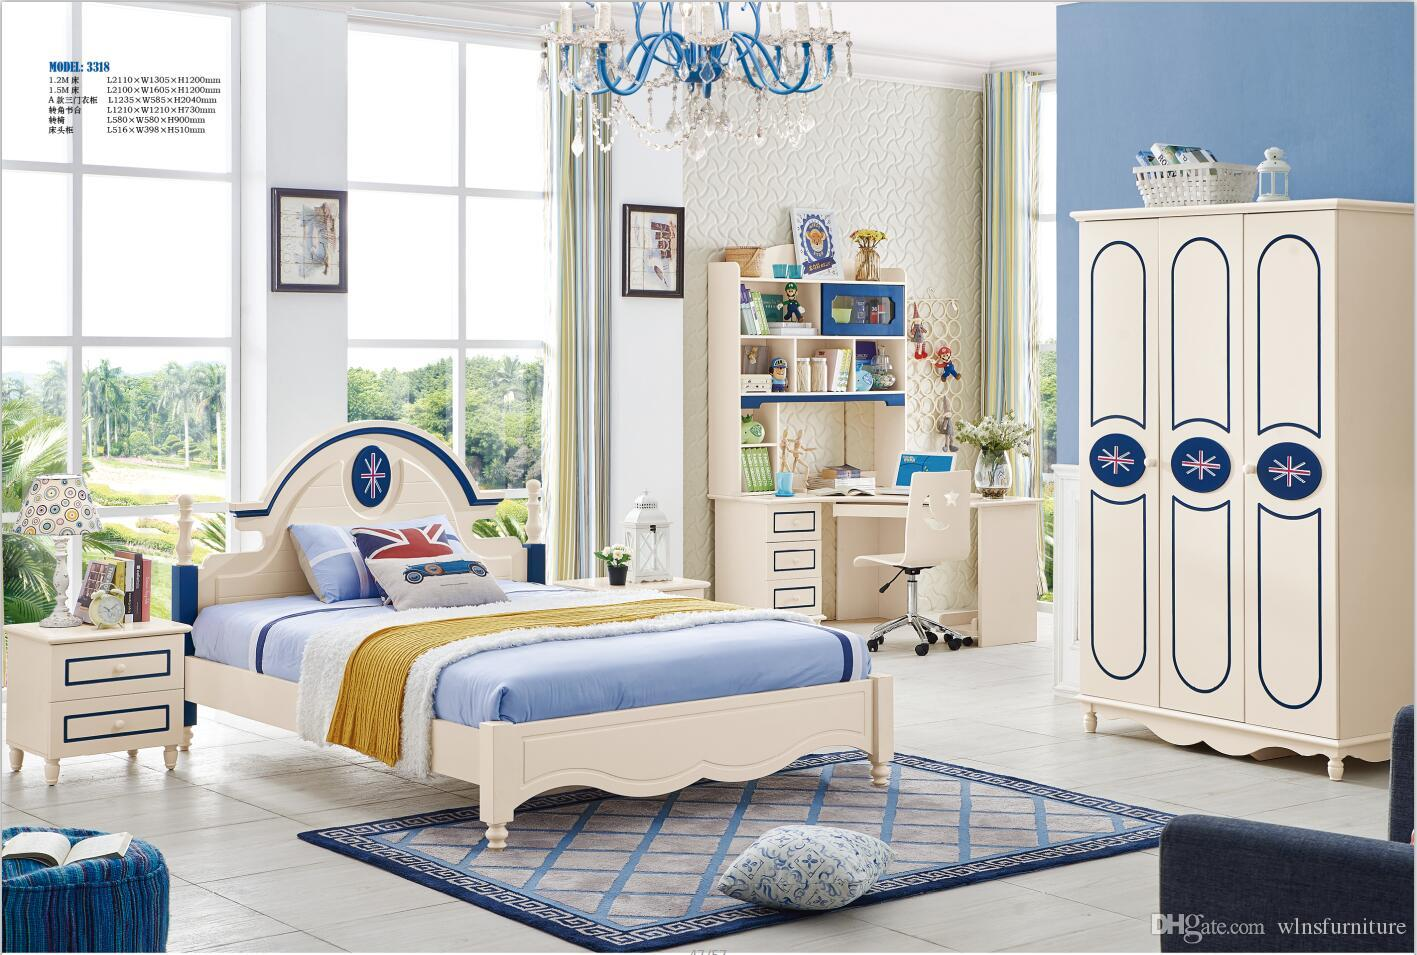 Acheter frêne bois massif enfants chambre mobilier de mode moderne